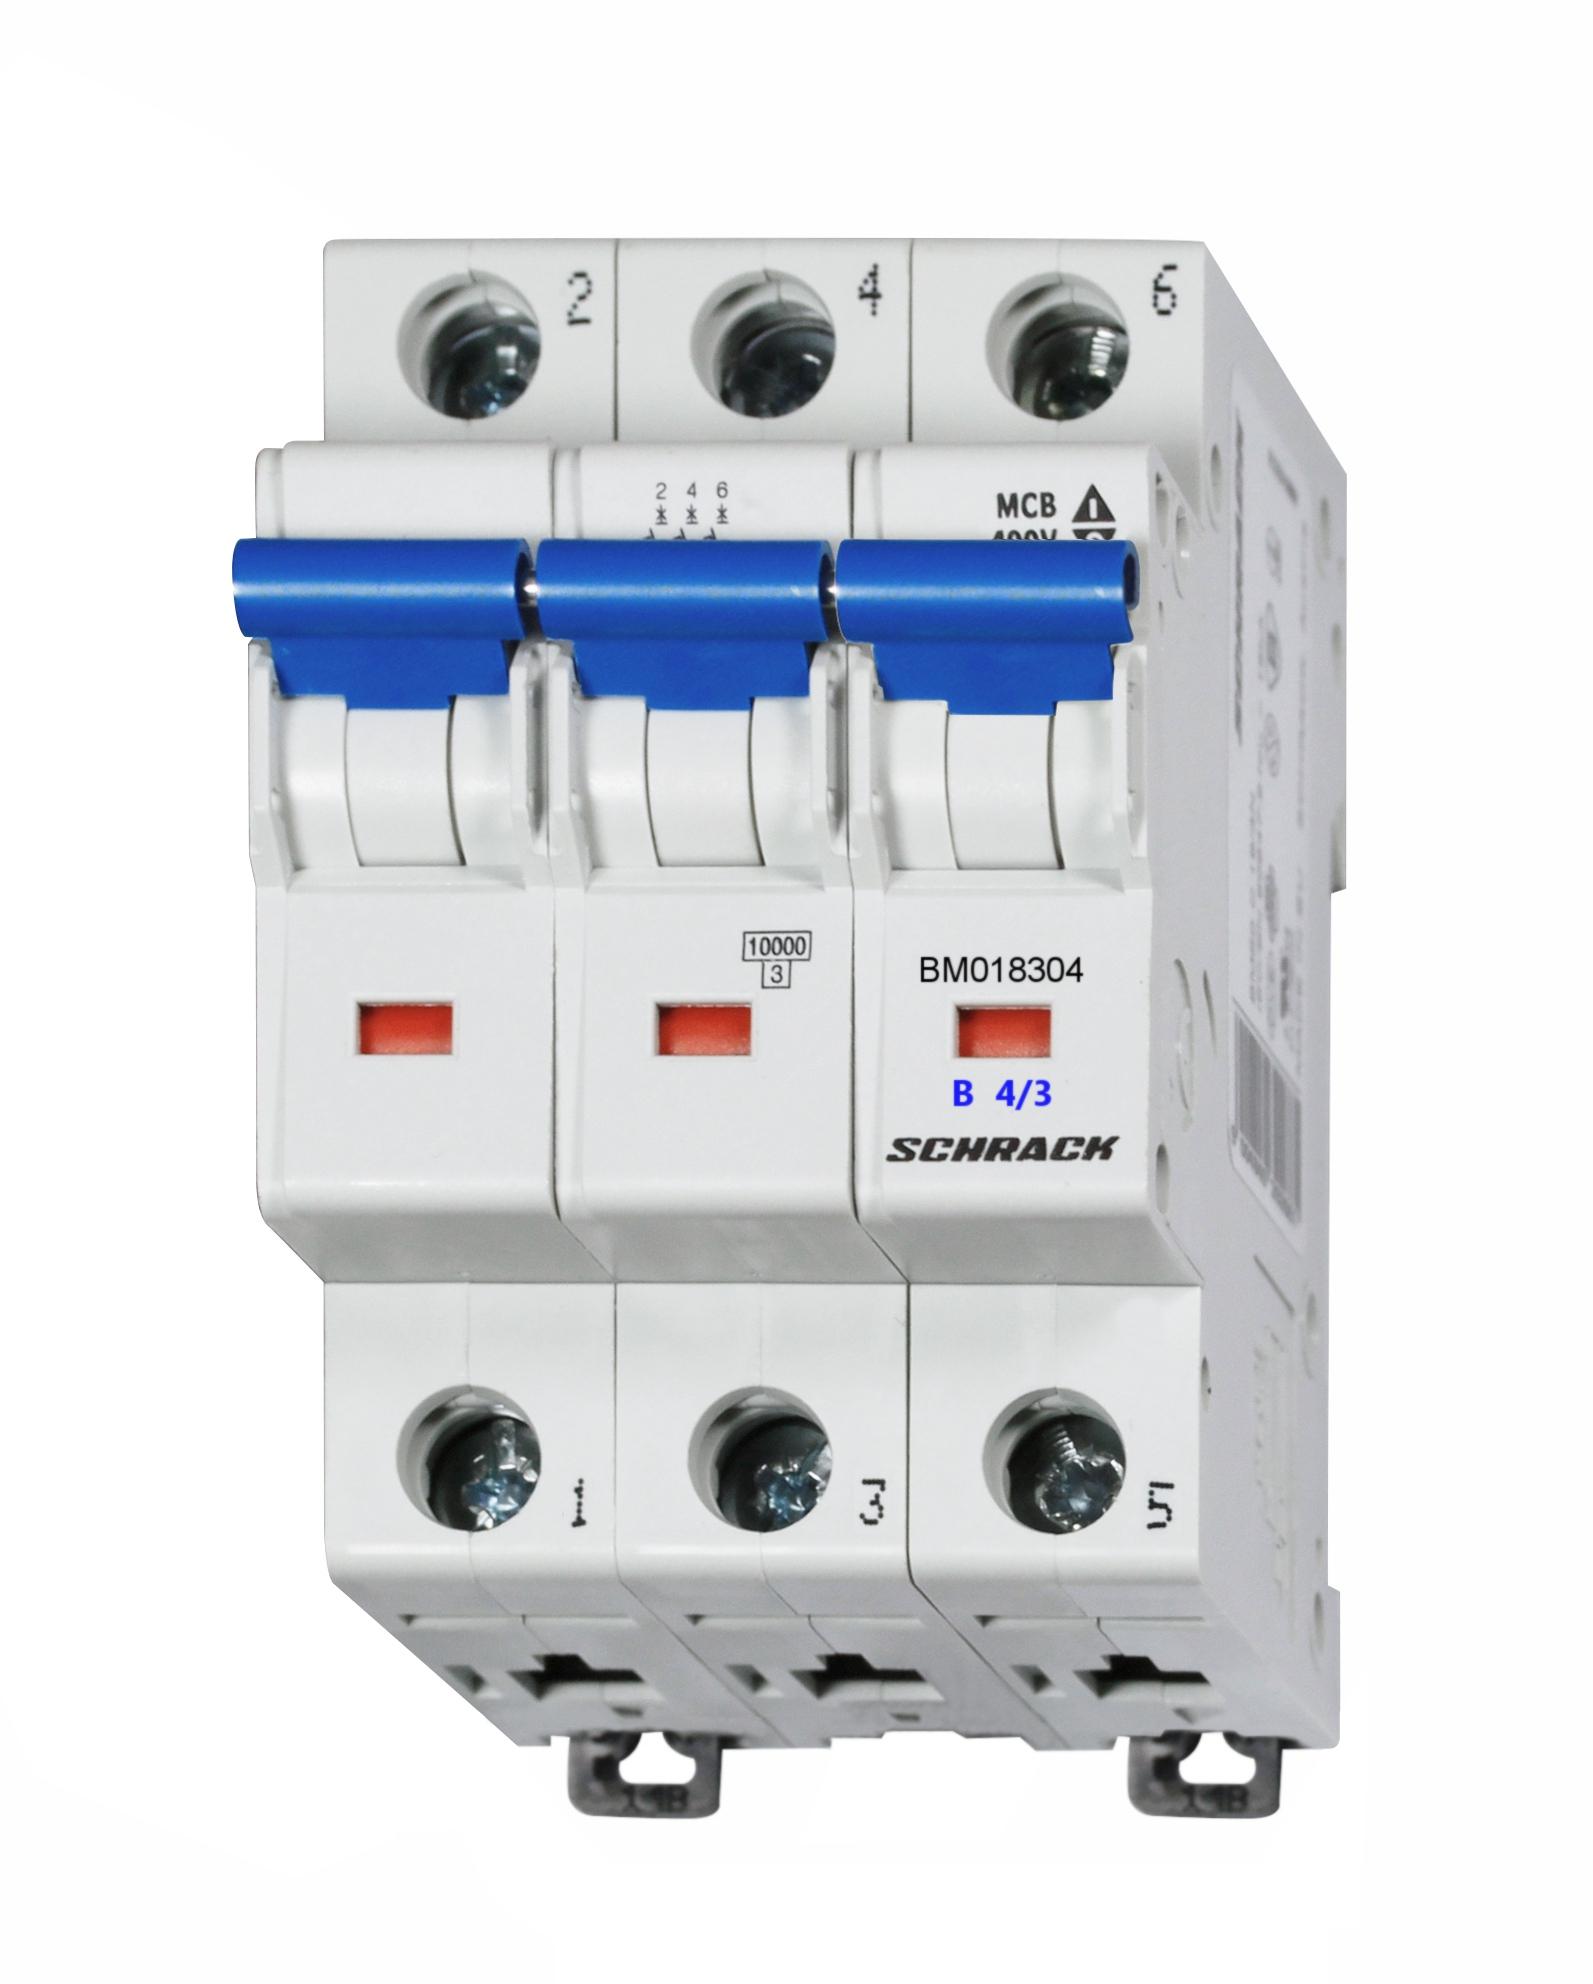 1 Stk Sicherungsautomat, Kennlinie B, 4A, 3-polig, 10kA BM018304--